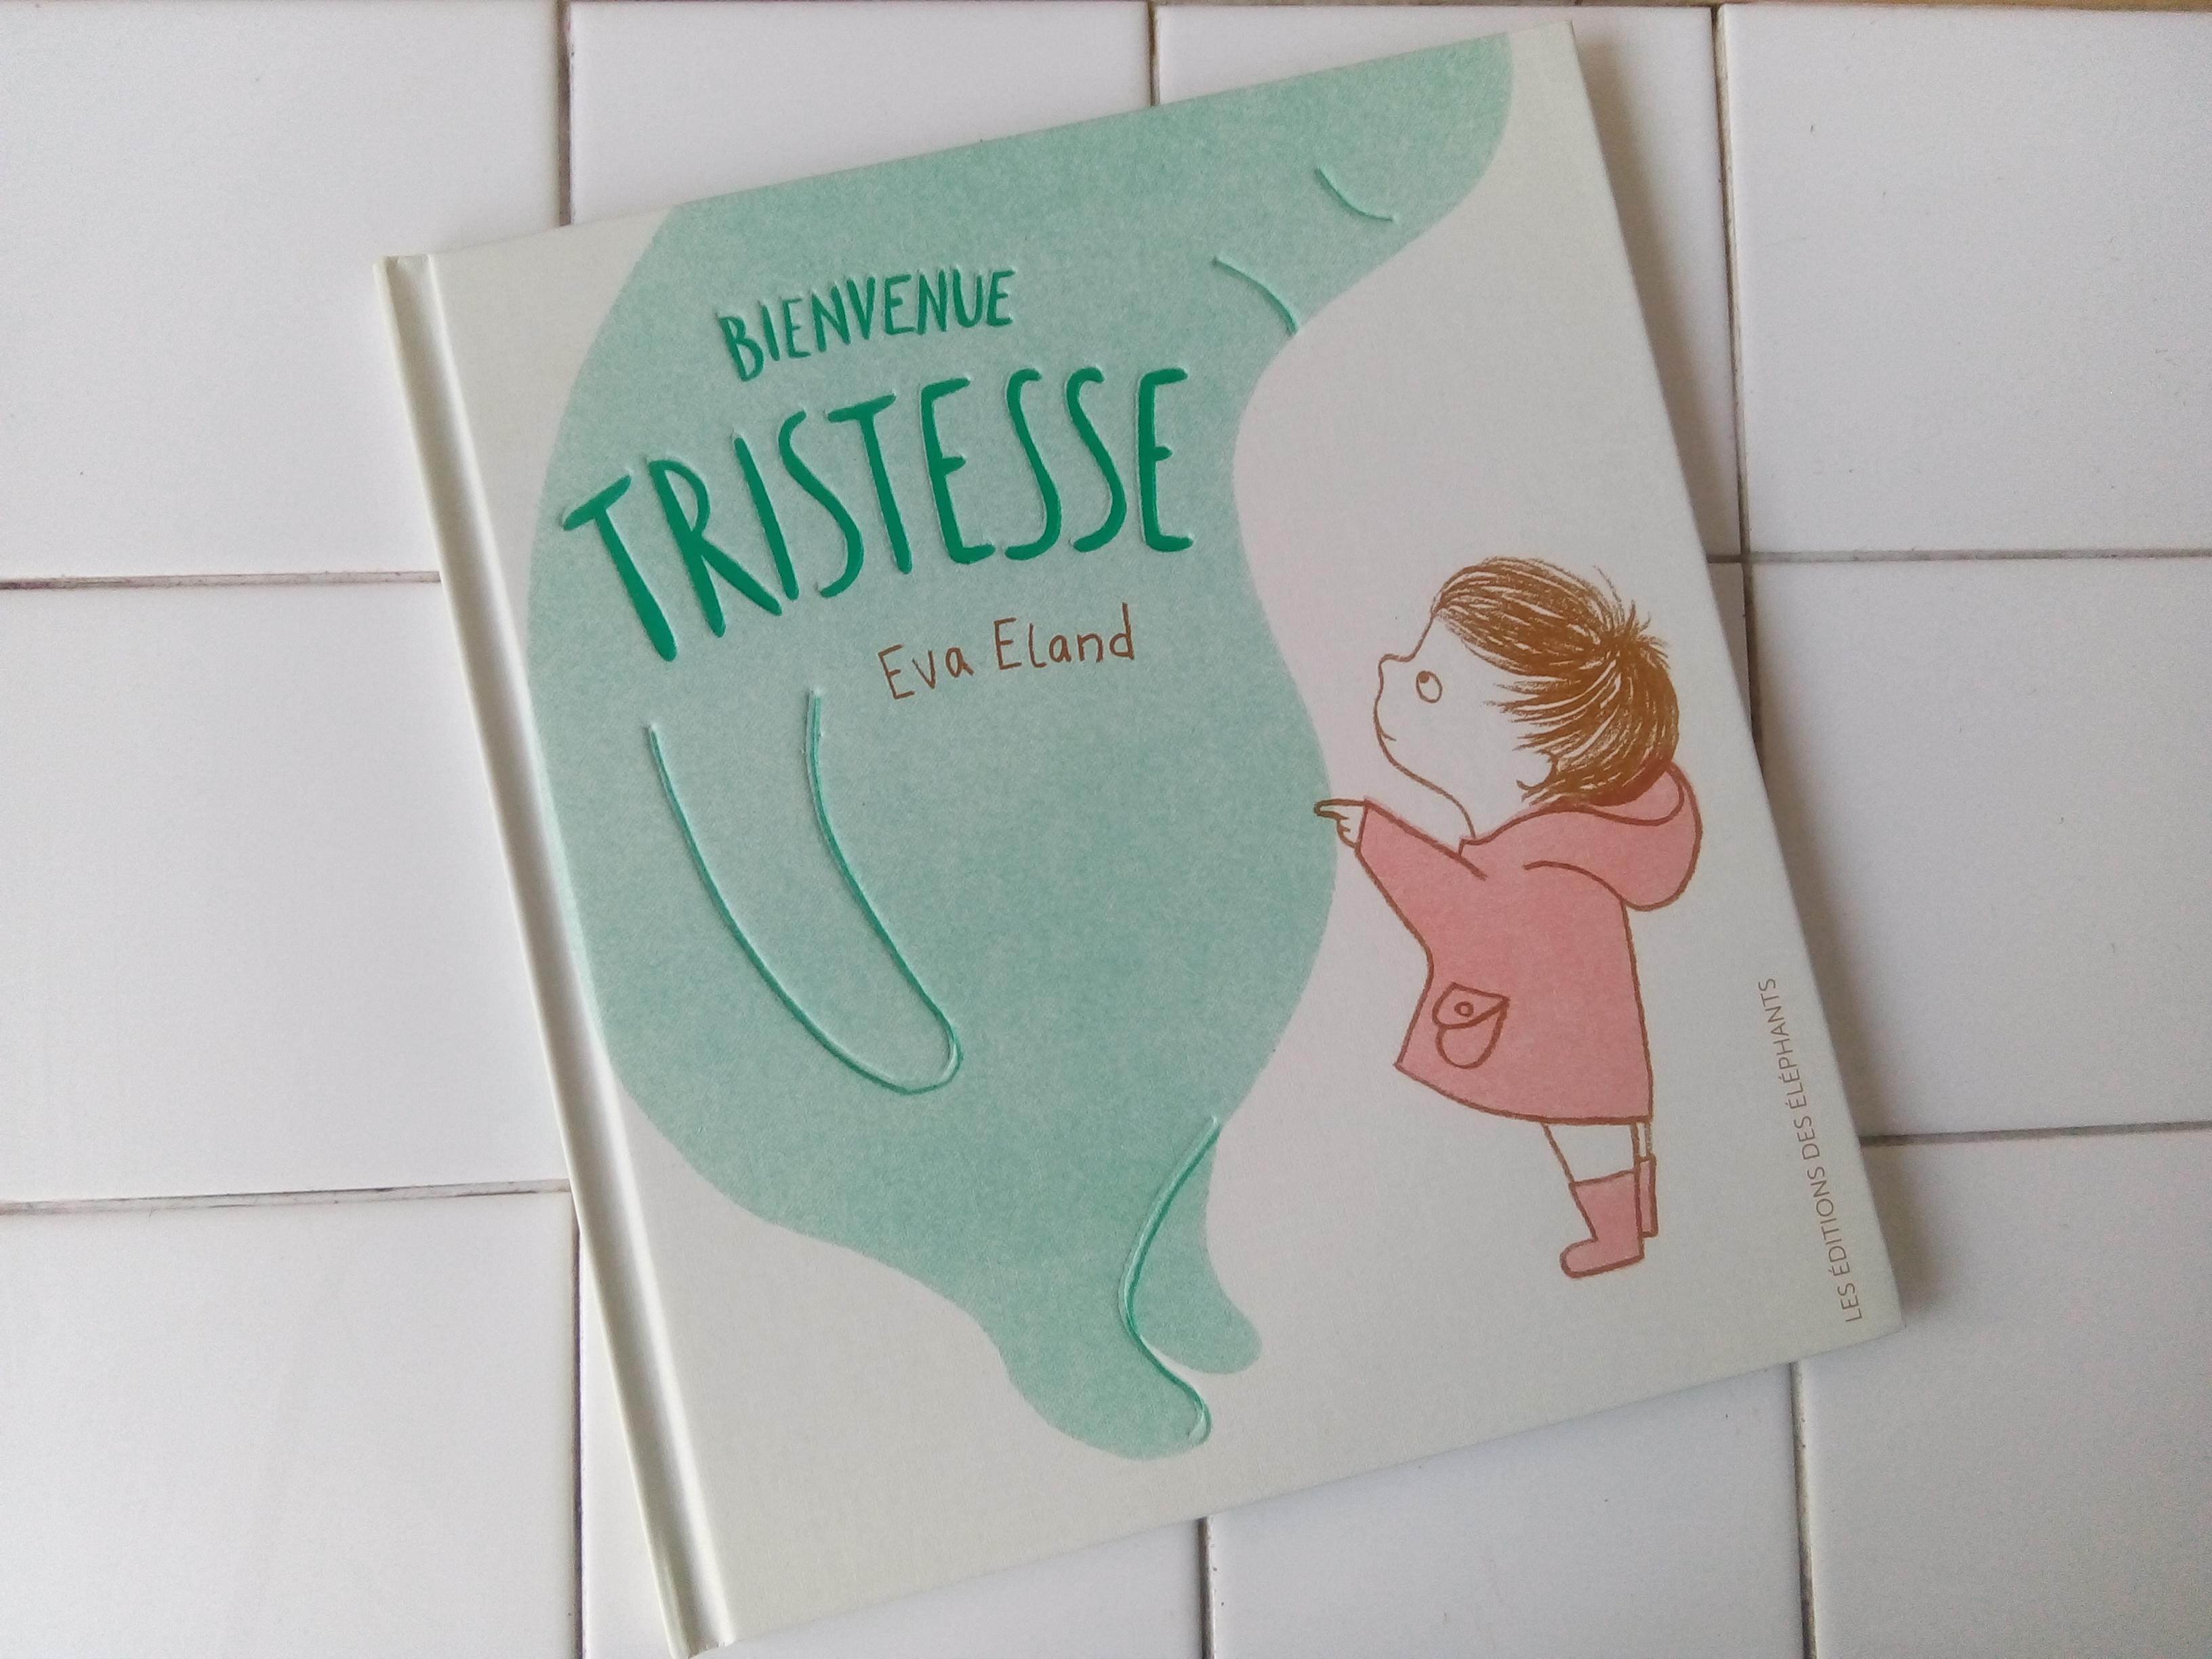 Bienvenue Tristesse